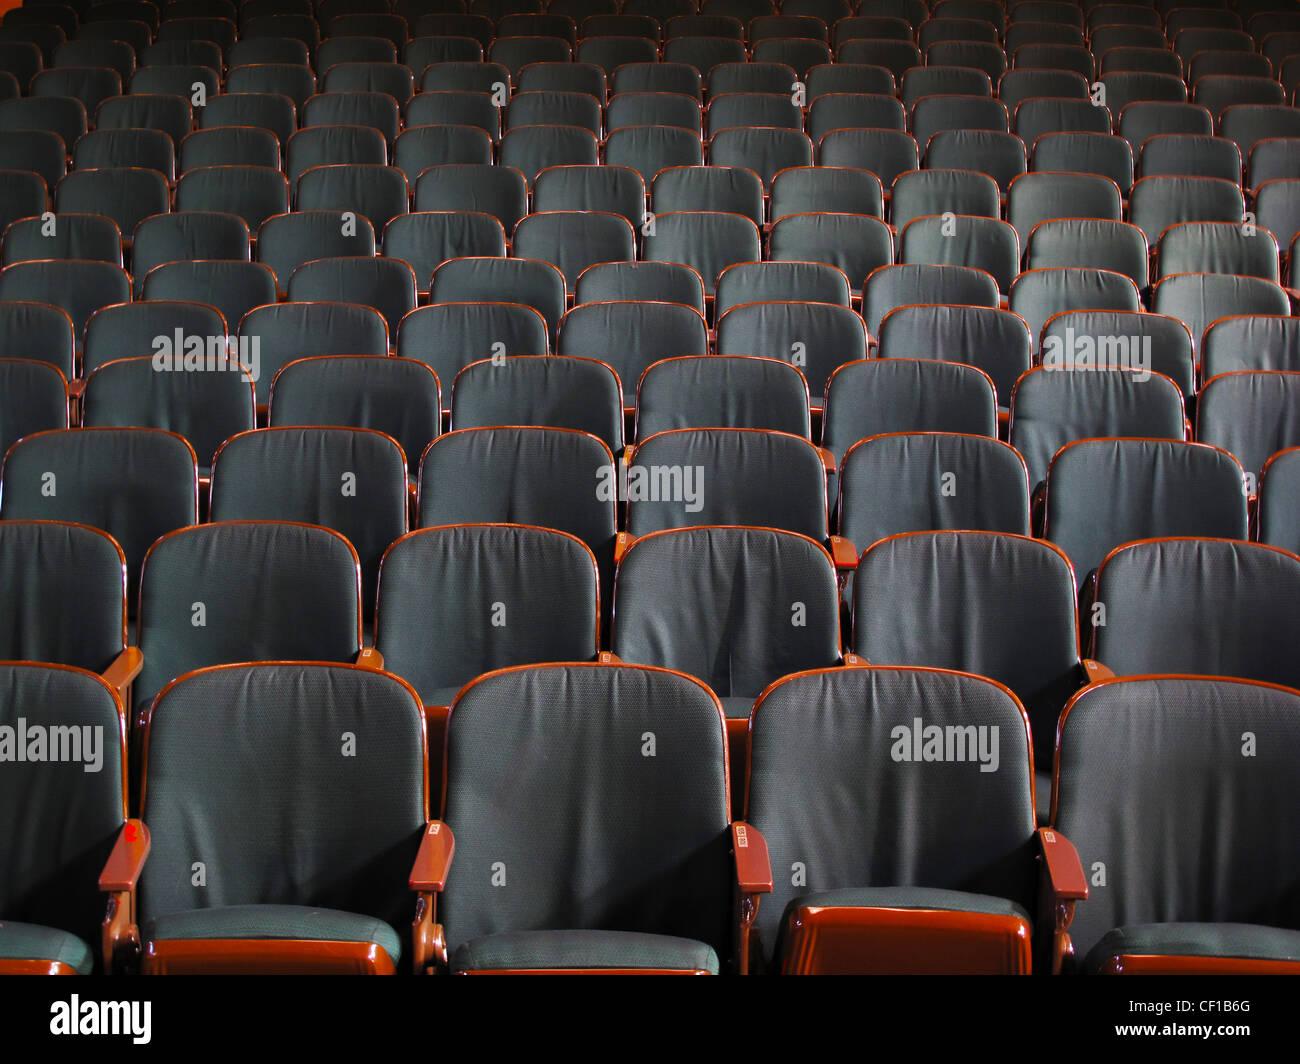 empty theater seats - Stock Image